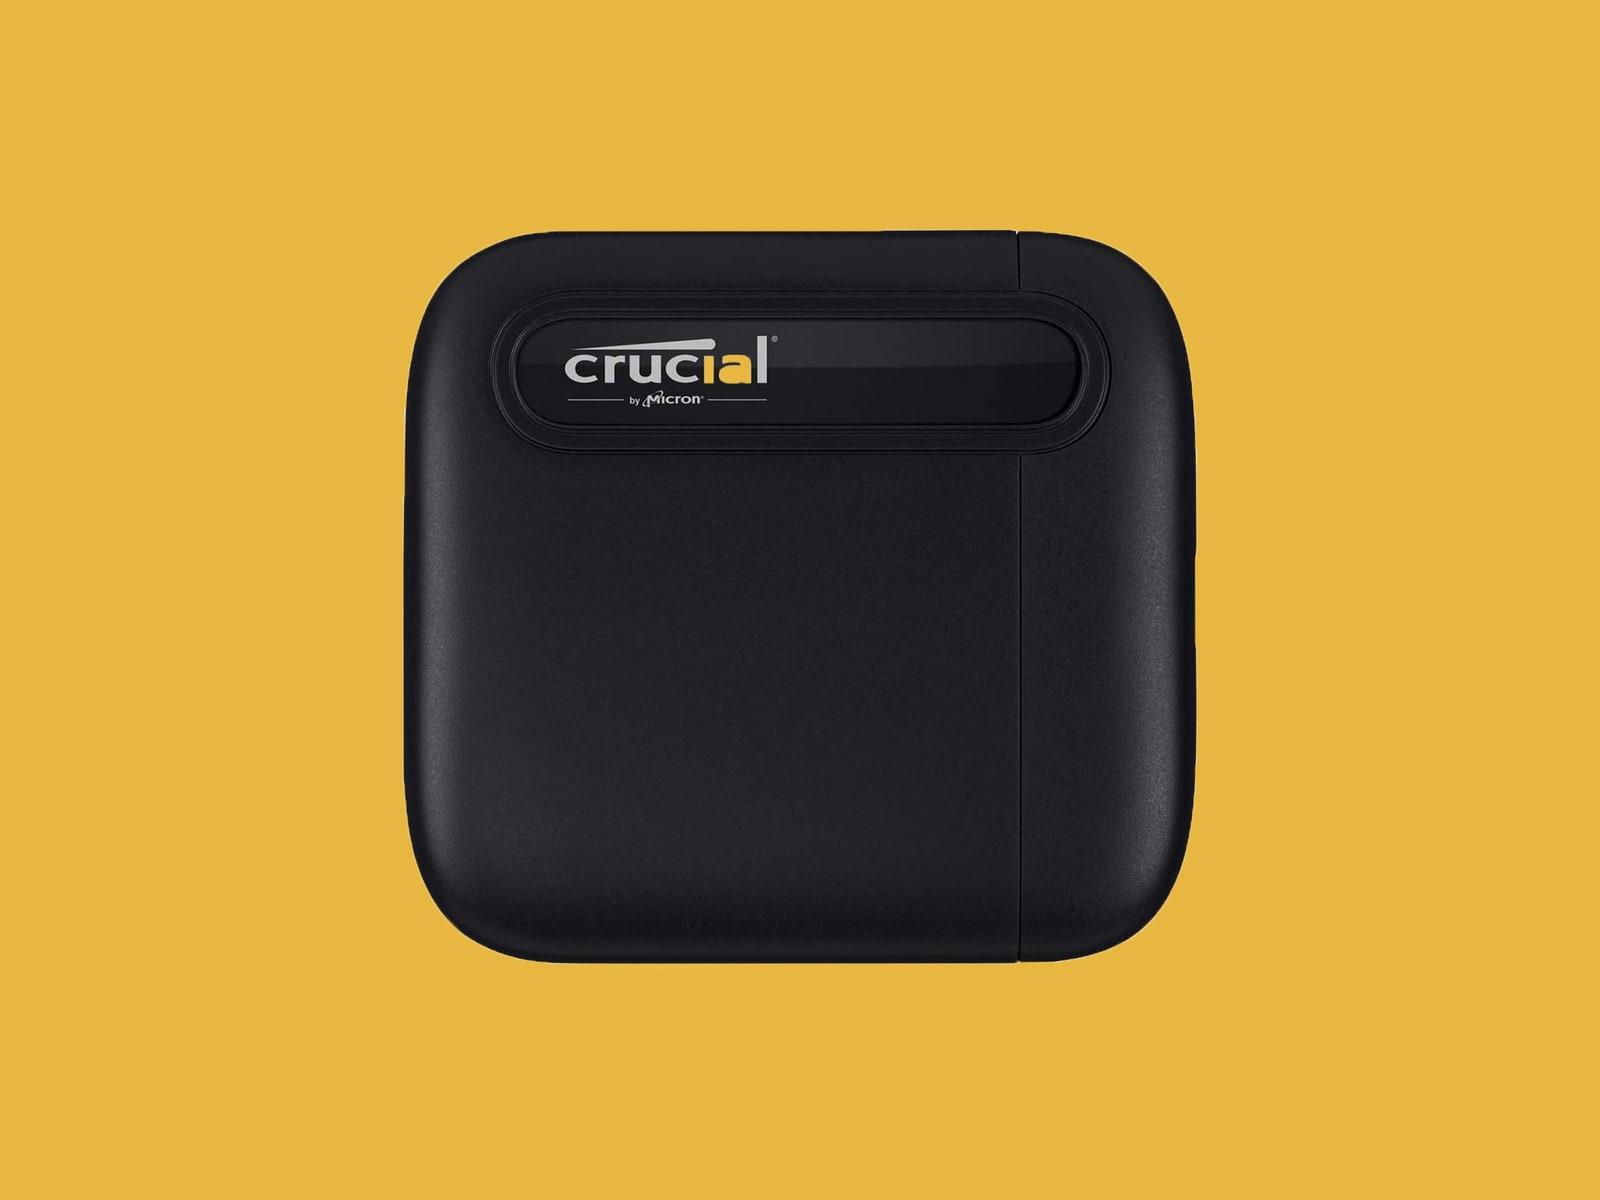 Crucial X6